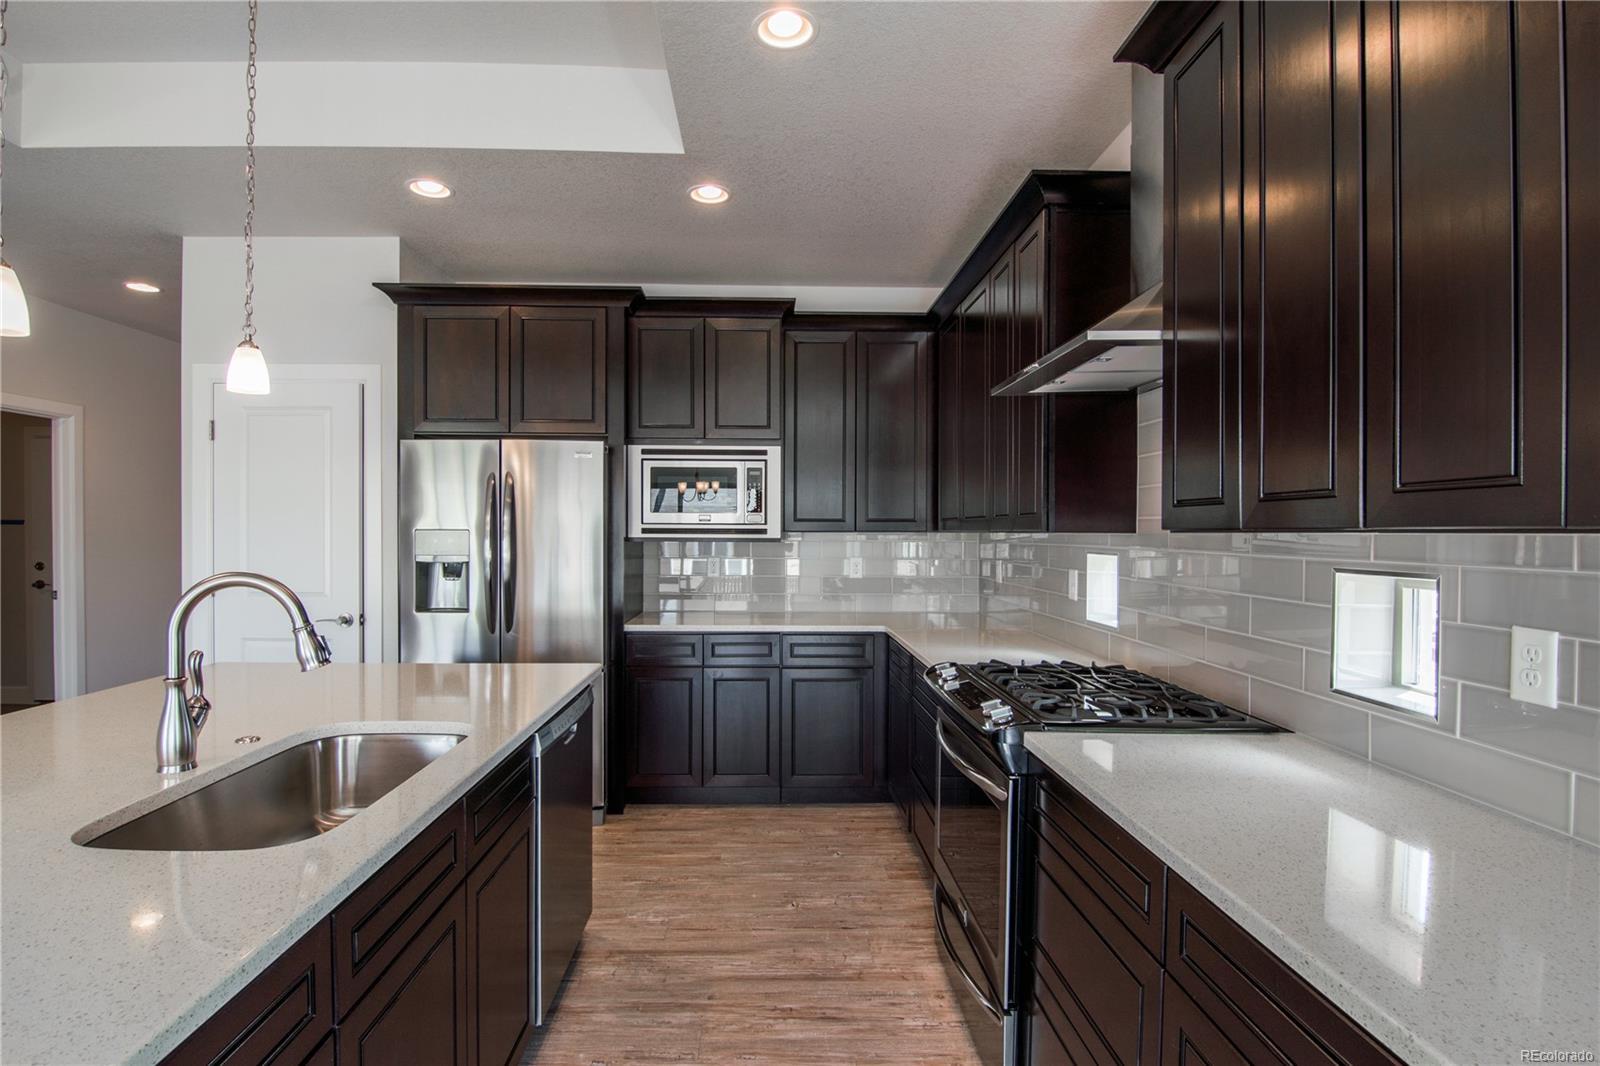 modern kitchen with range and island